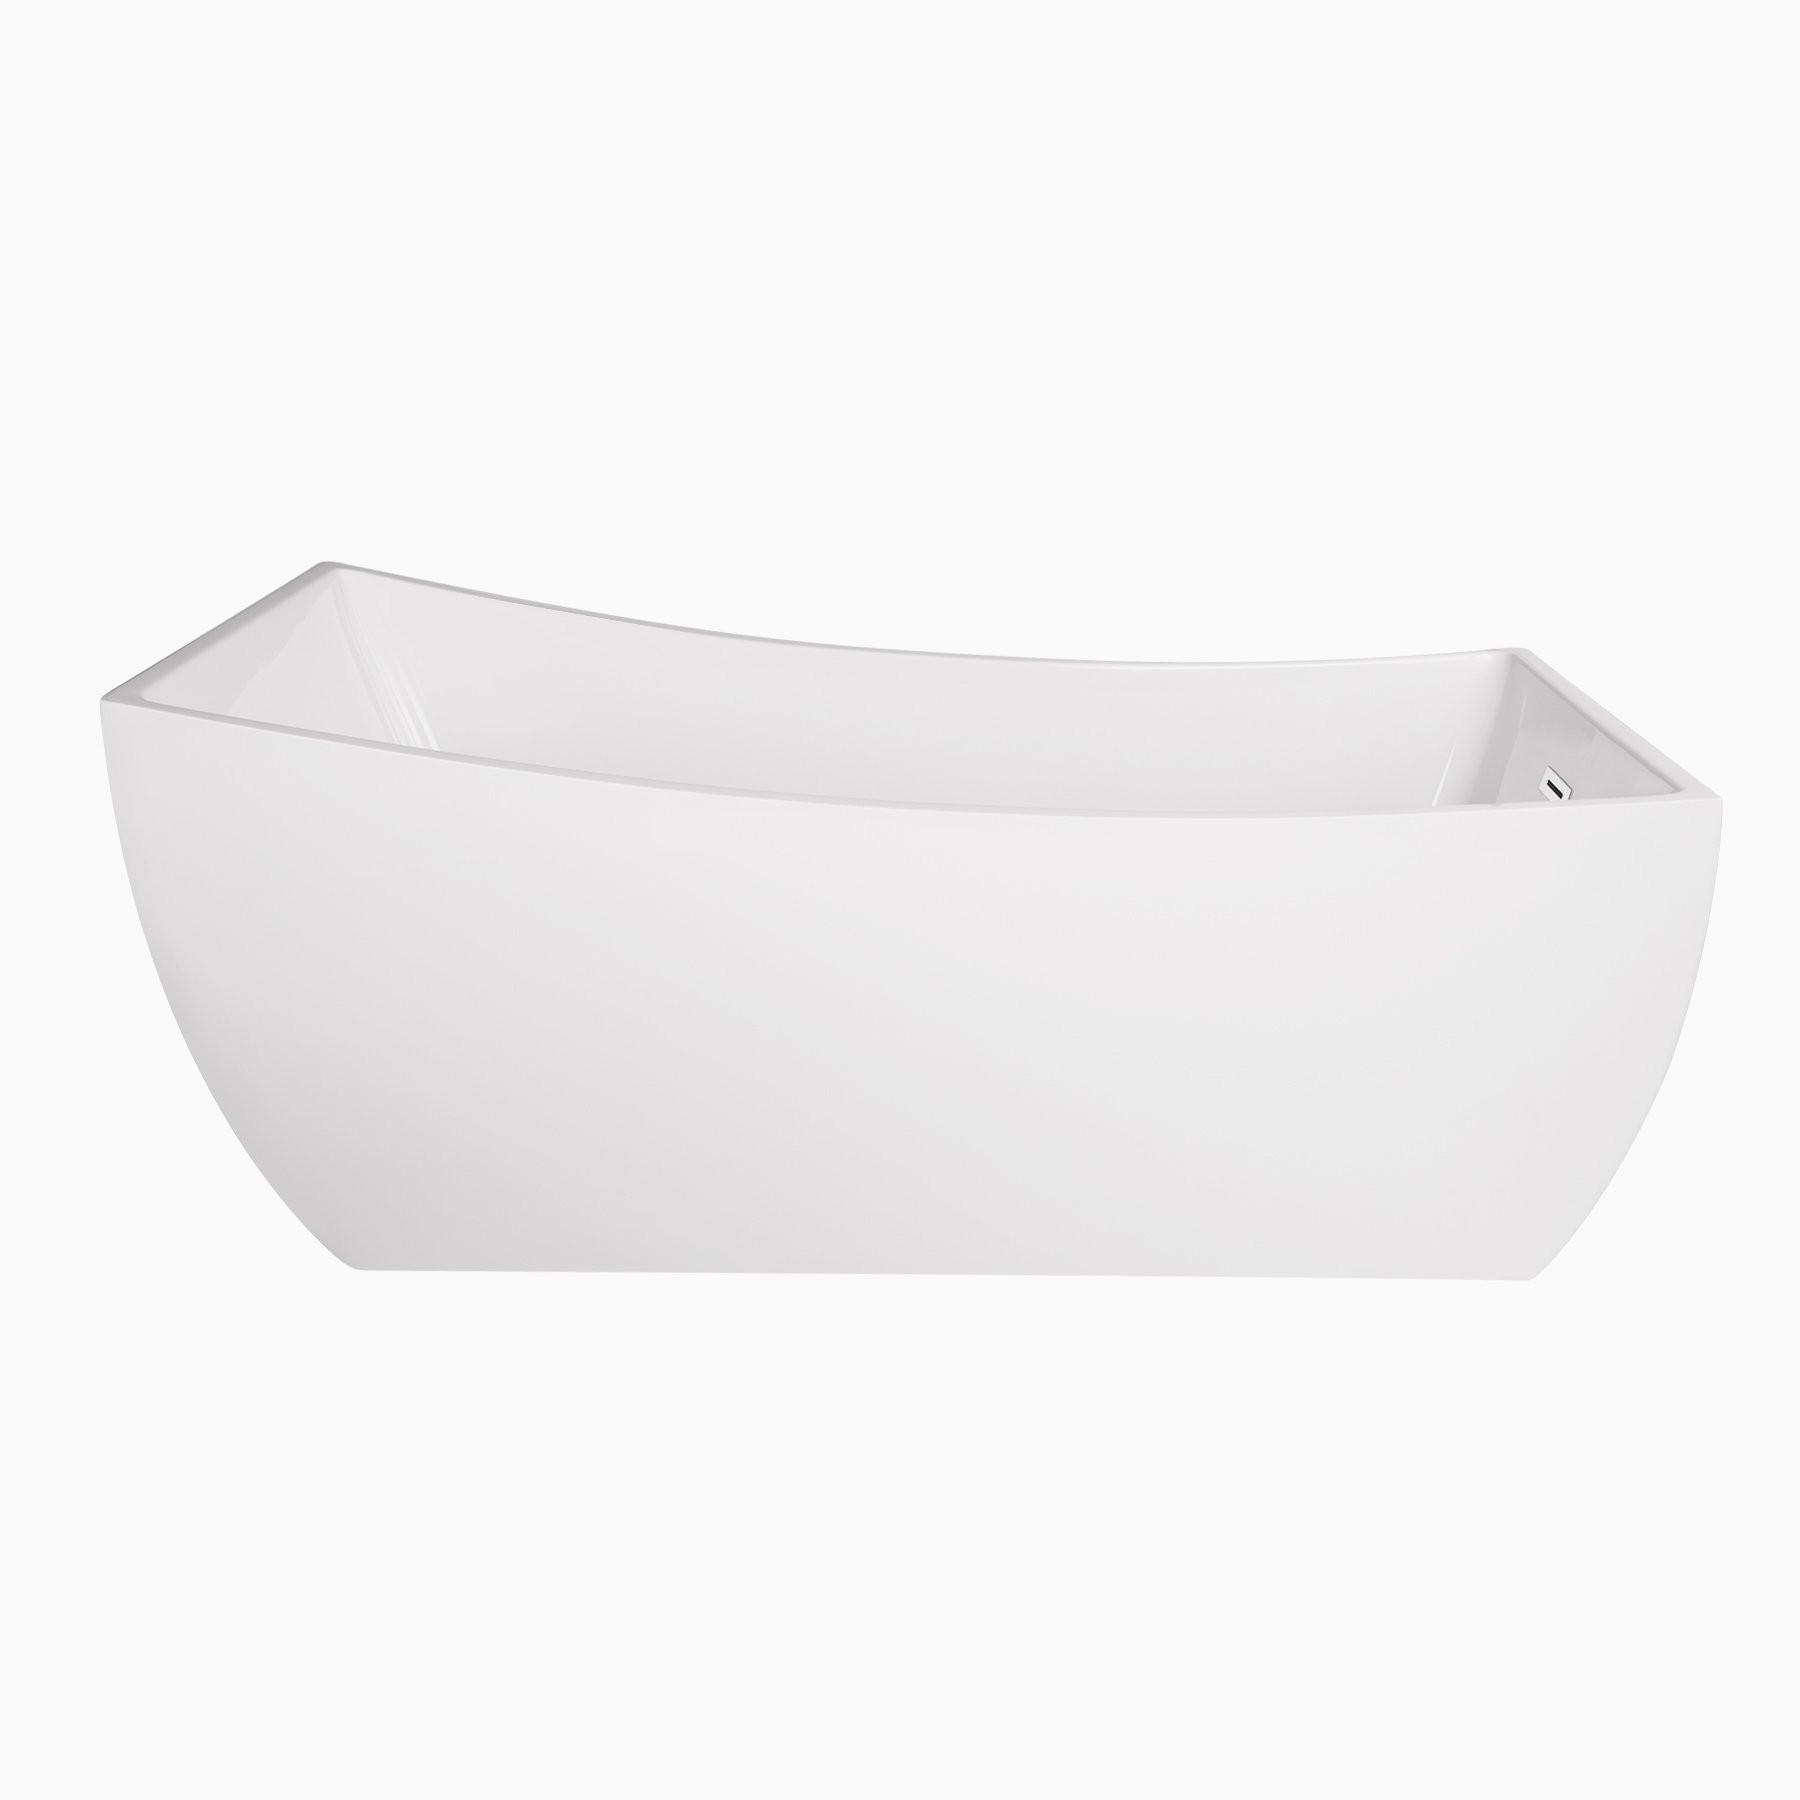 Bathtubs - Soaking Tubs for Sale - Deep Soaker Bath Tub